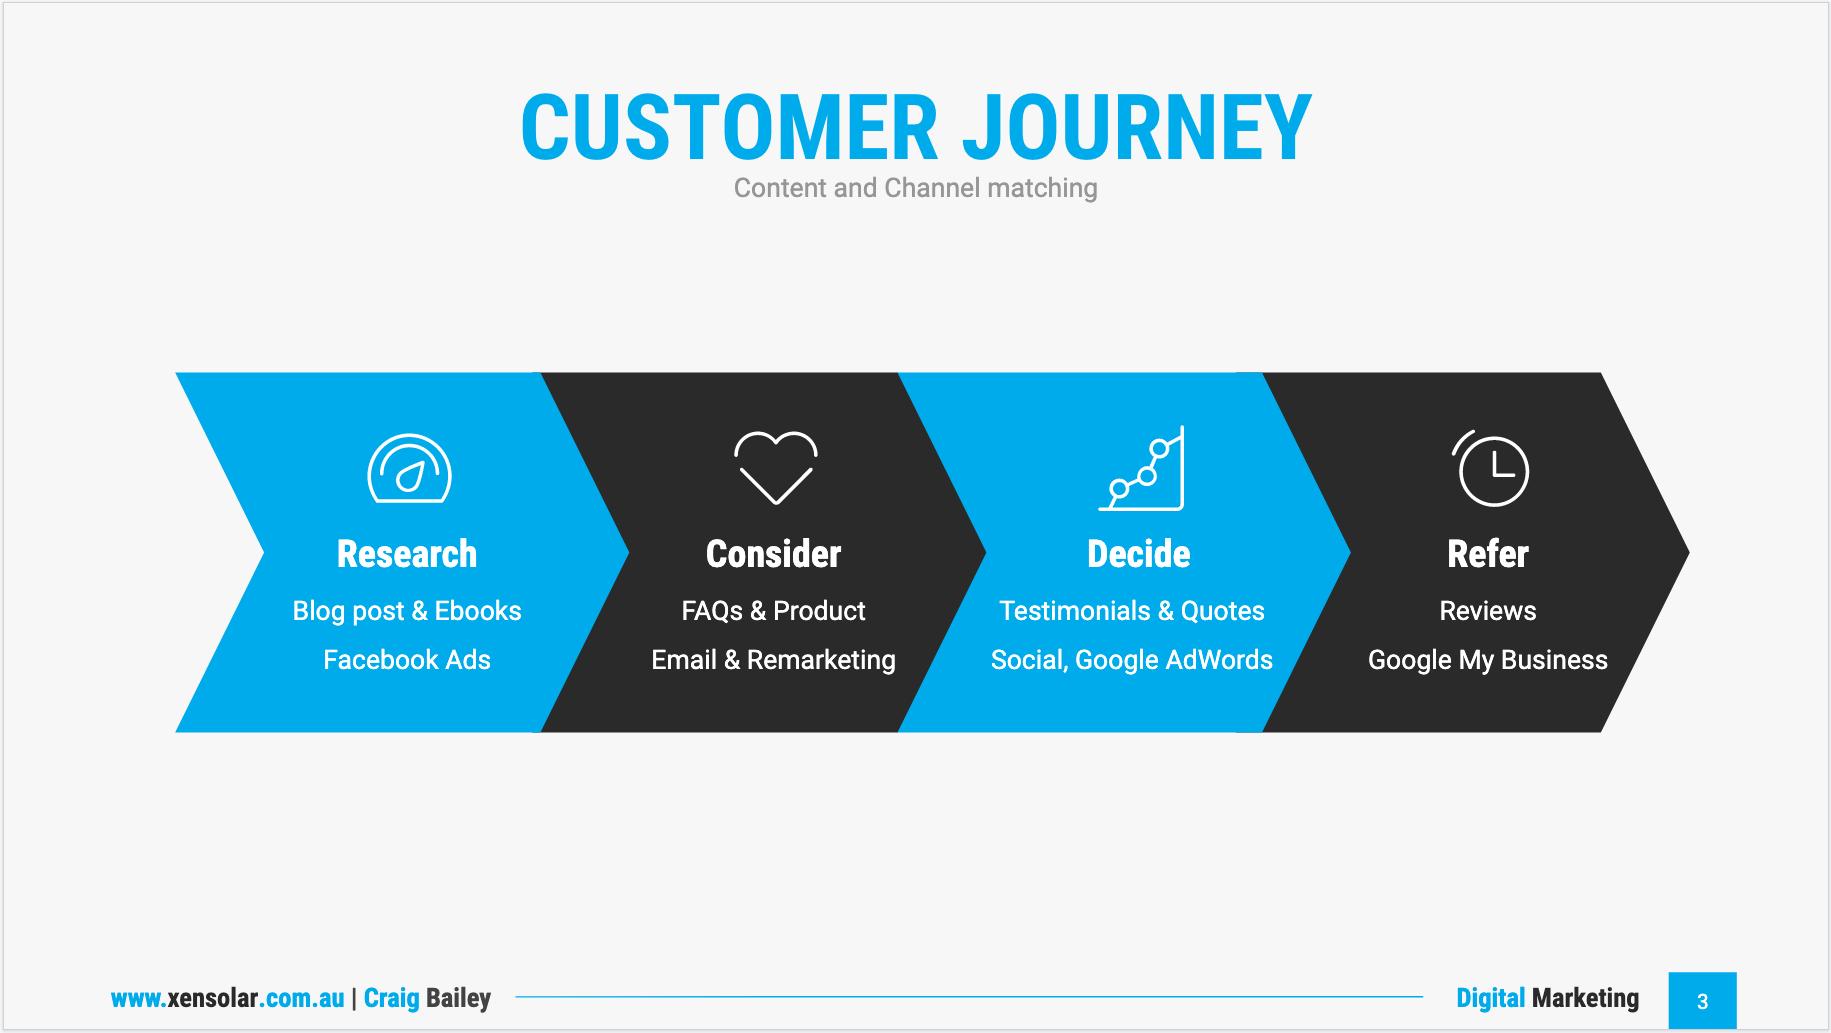 Customer Journey content assets